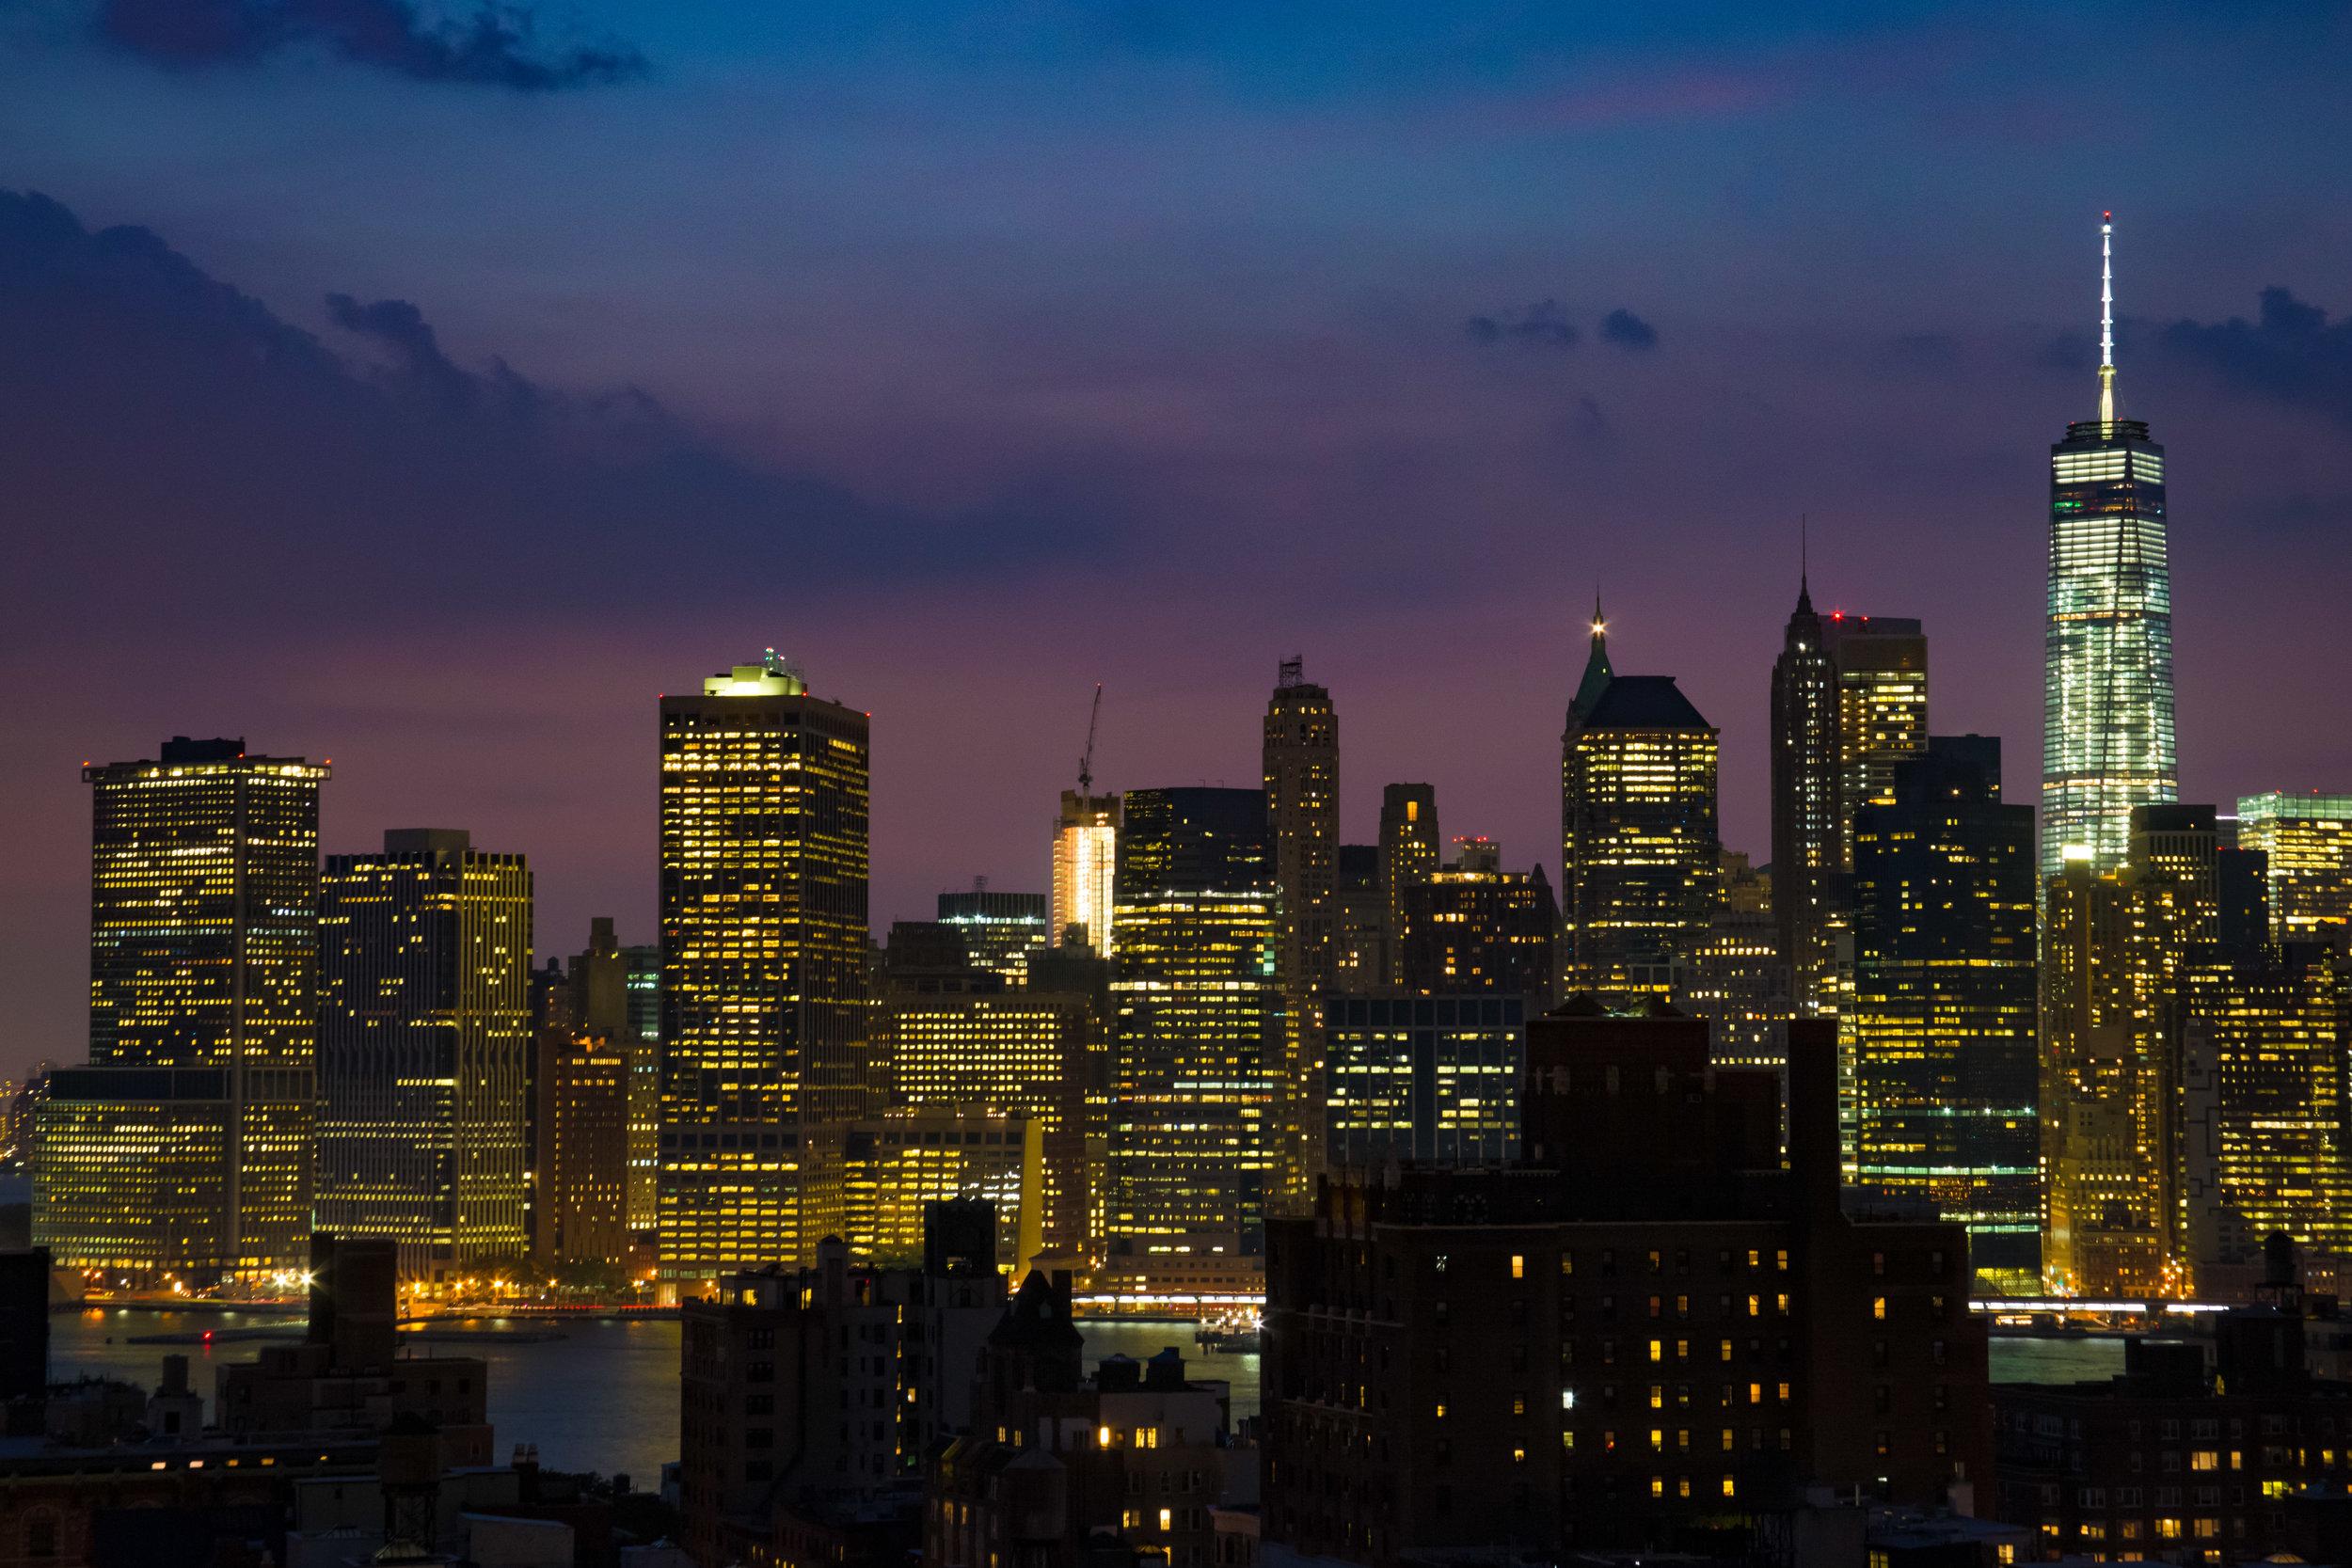 LSNY_Night_City_Views-36.jpg